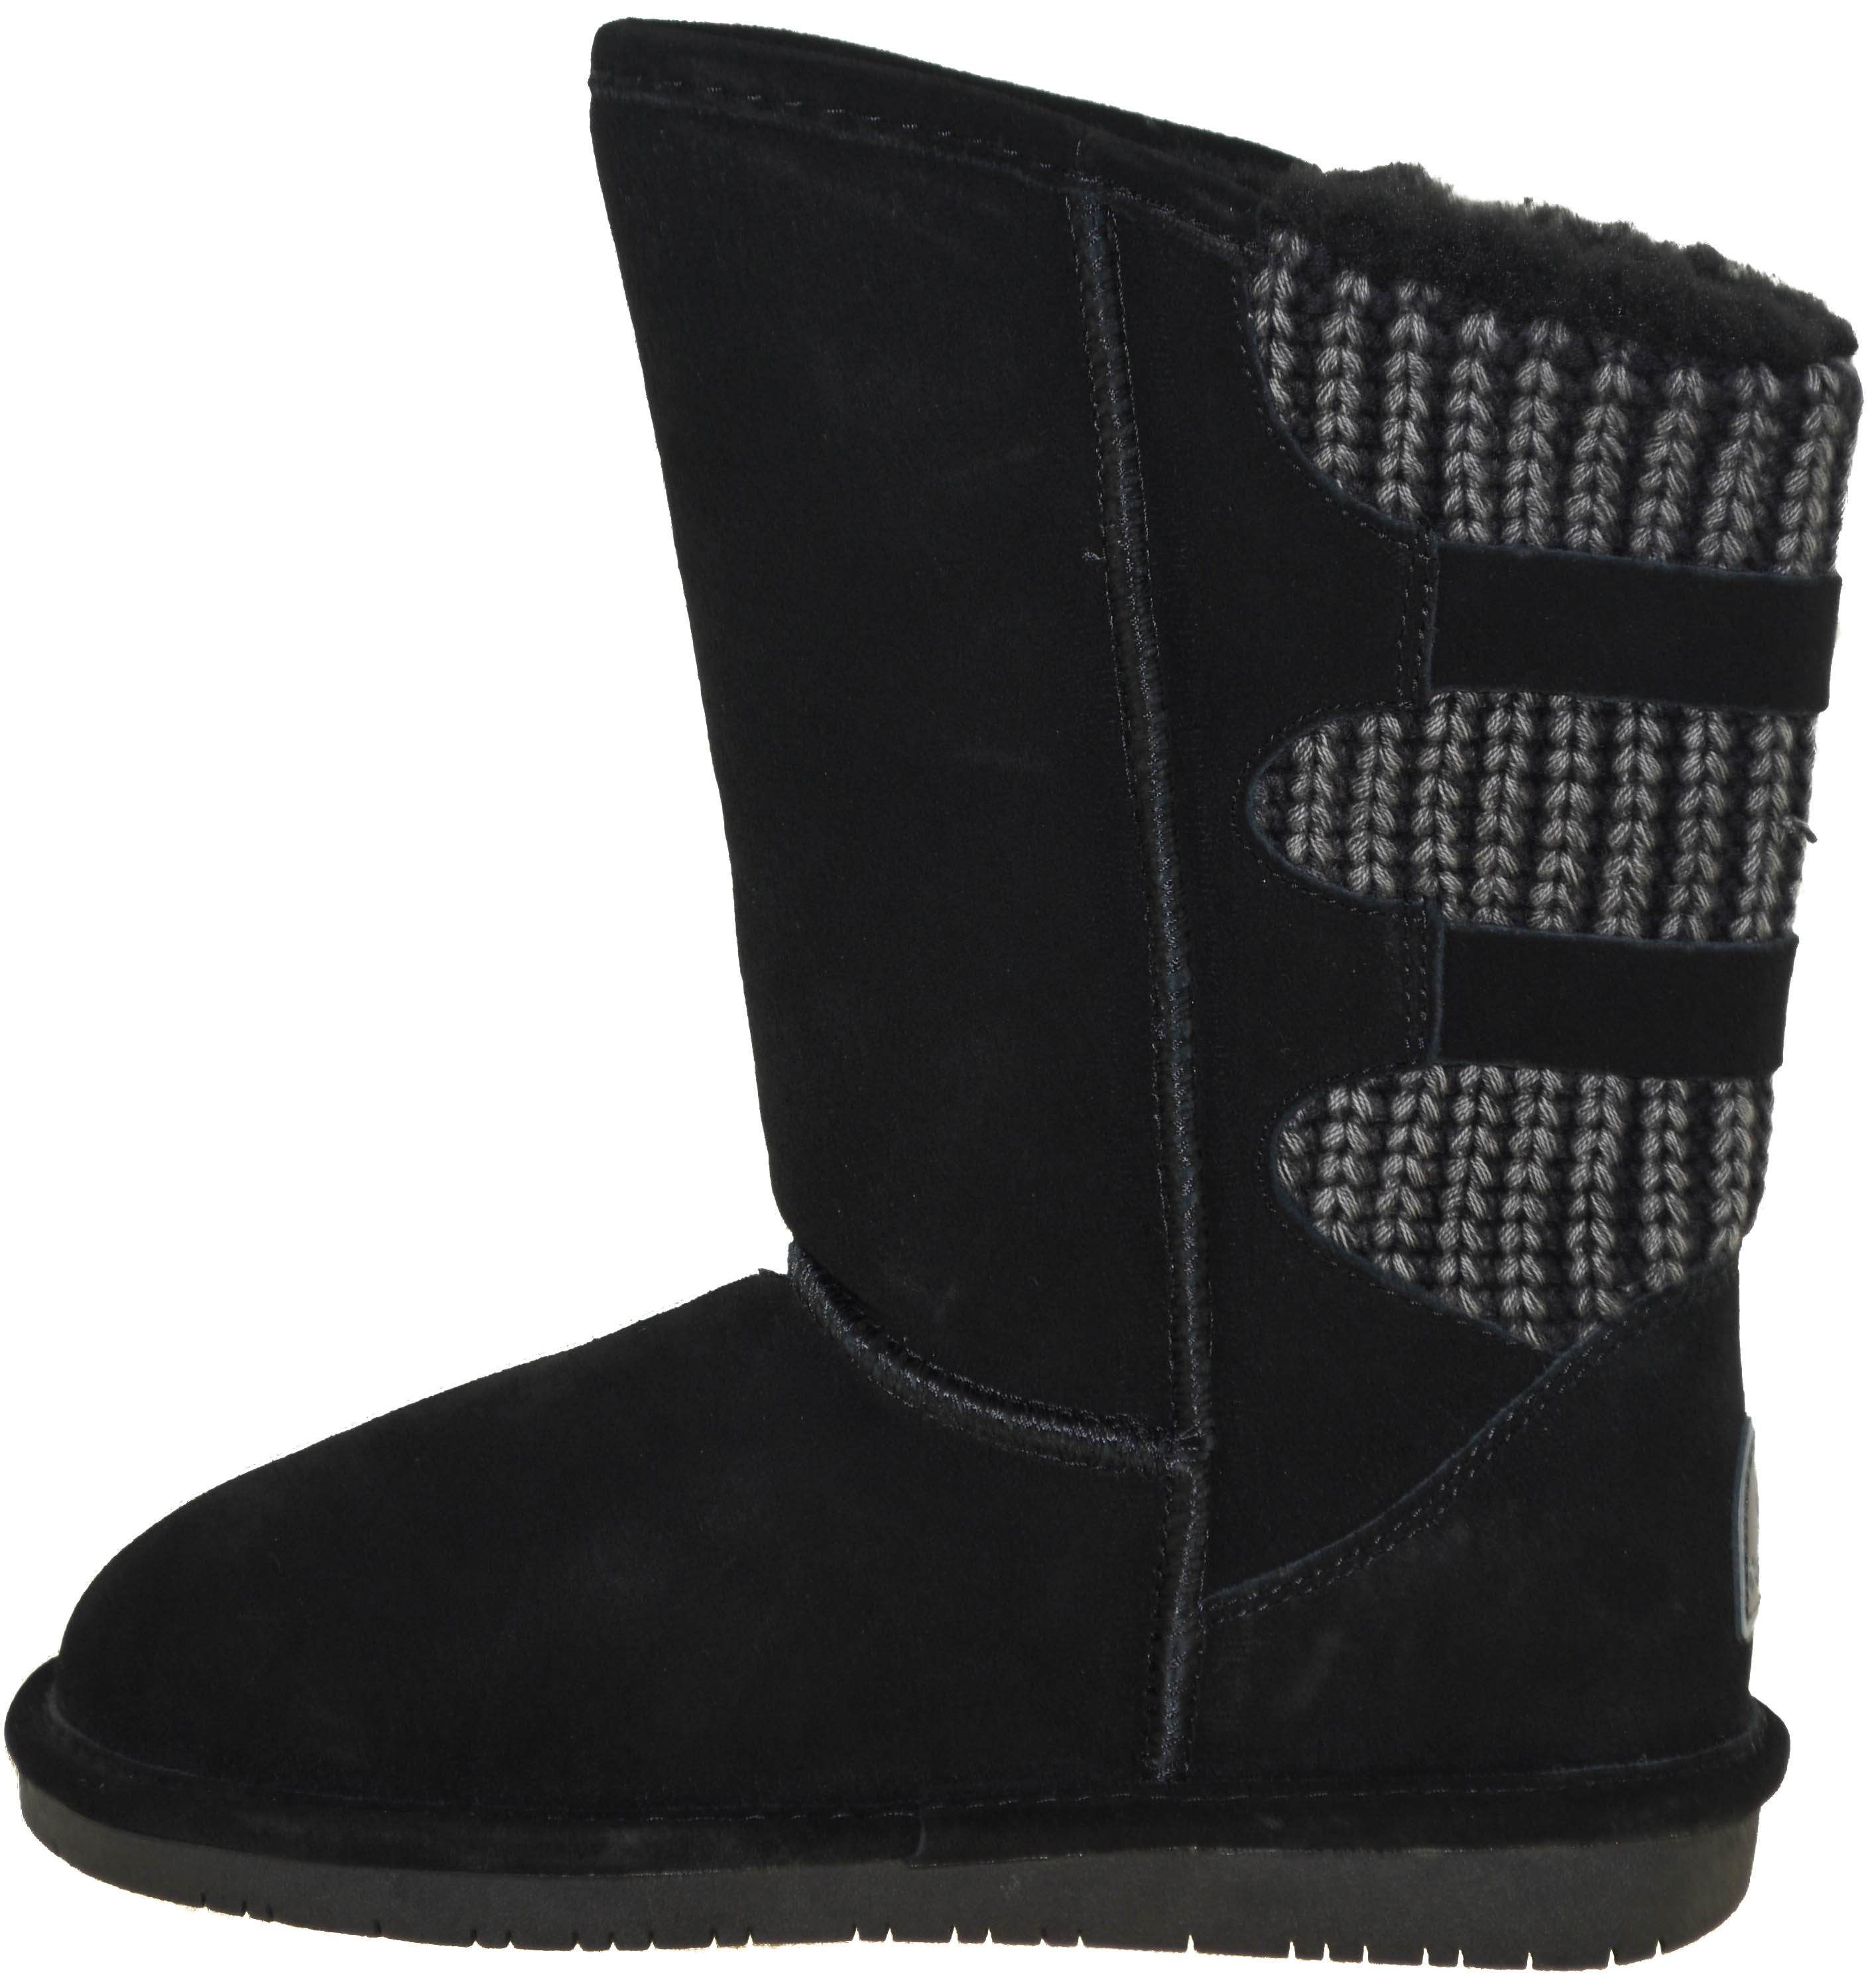 ac0907a13750 Bearpaw Women s Boshie Winter Boot Style 1669W Black